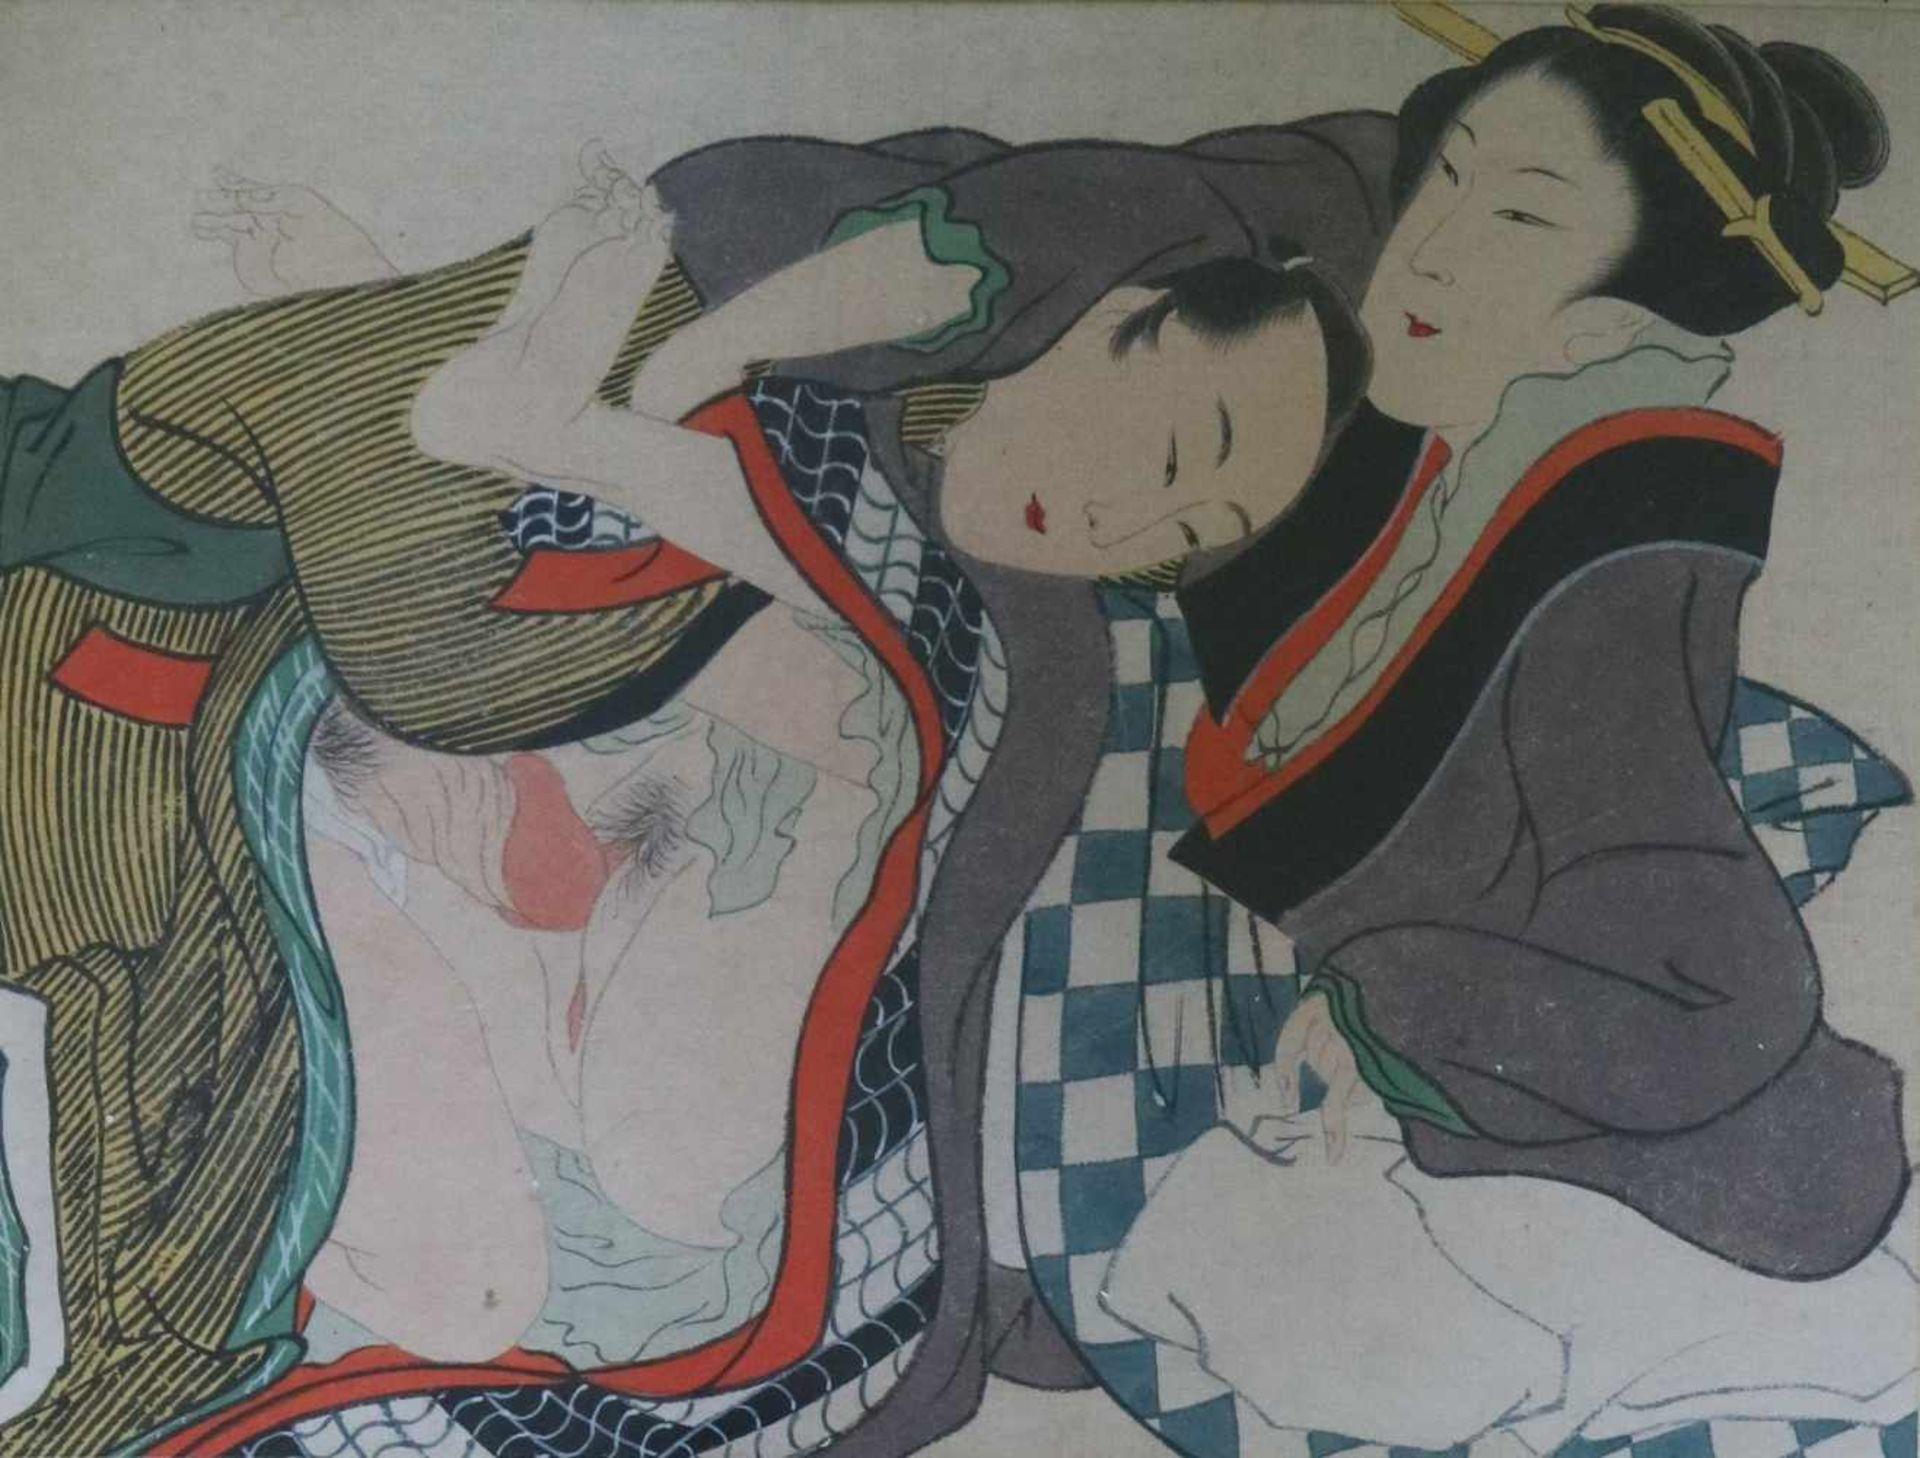 Los 68 - Japanese Shunga erotic prints (2) 31 x 21 cm